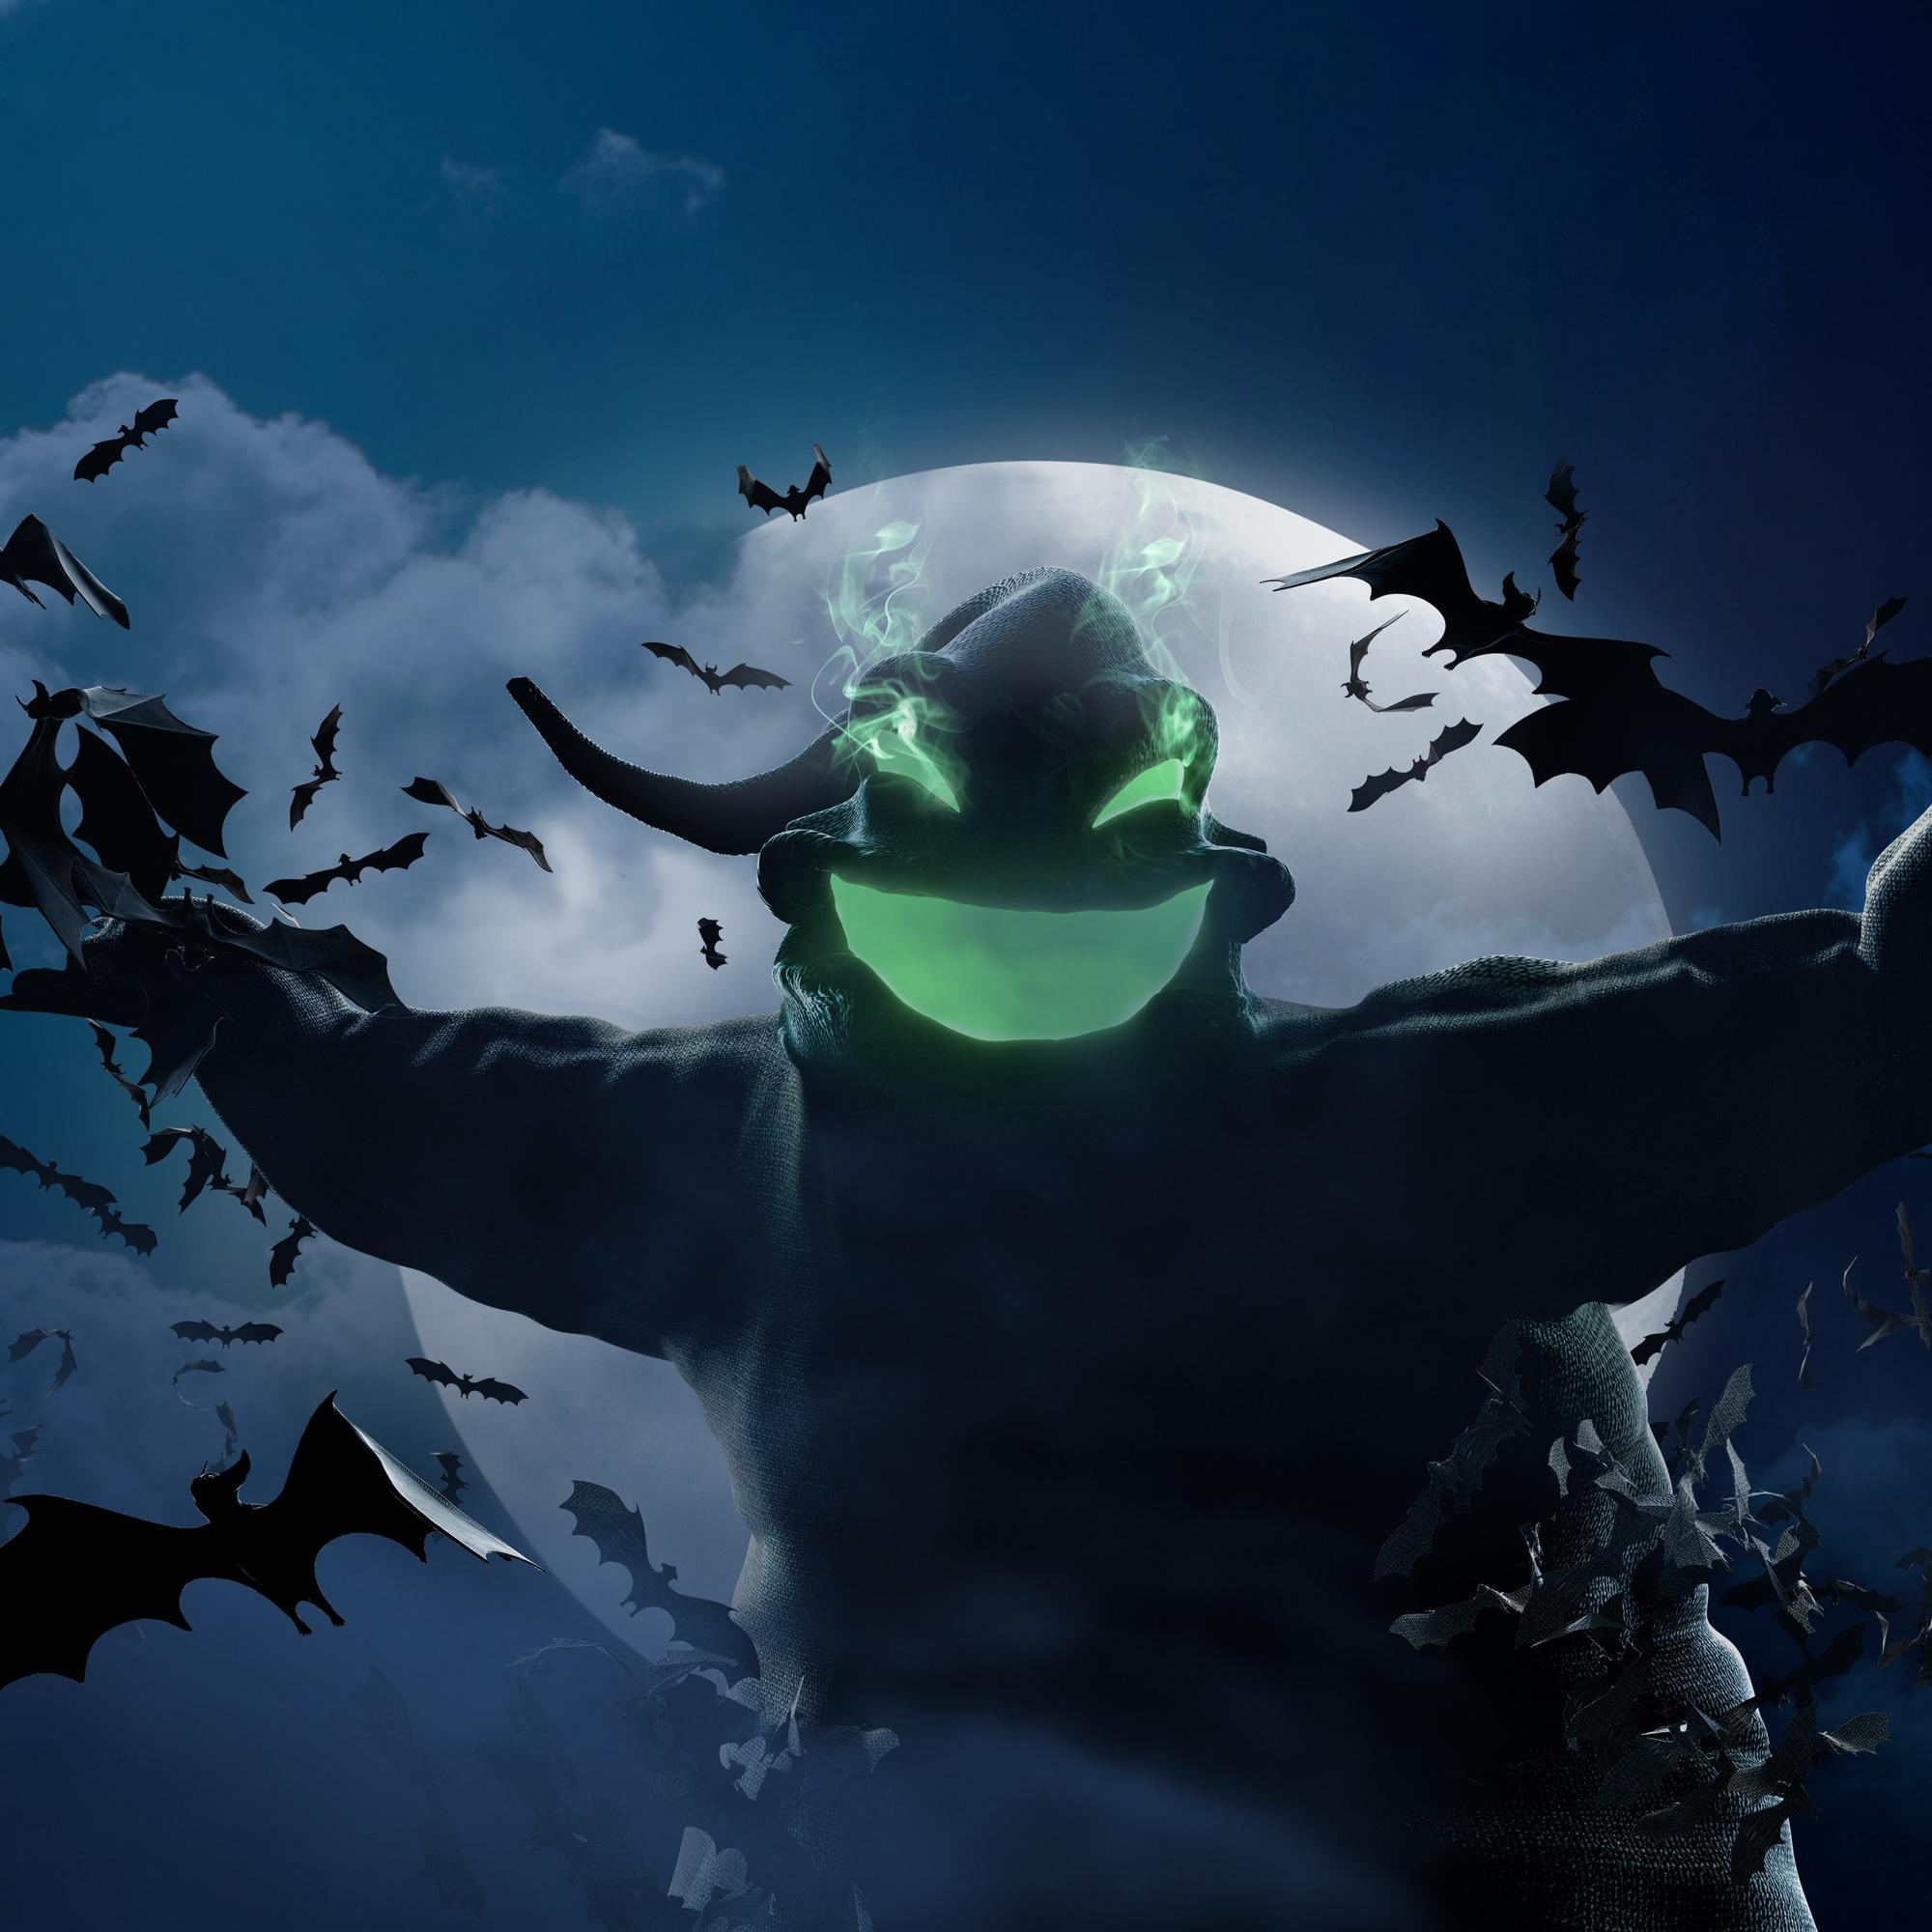 halloween time at the disneyland resort through oct 31 - Disneyland Hours Halloween